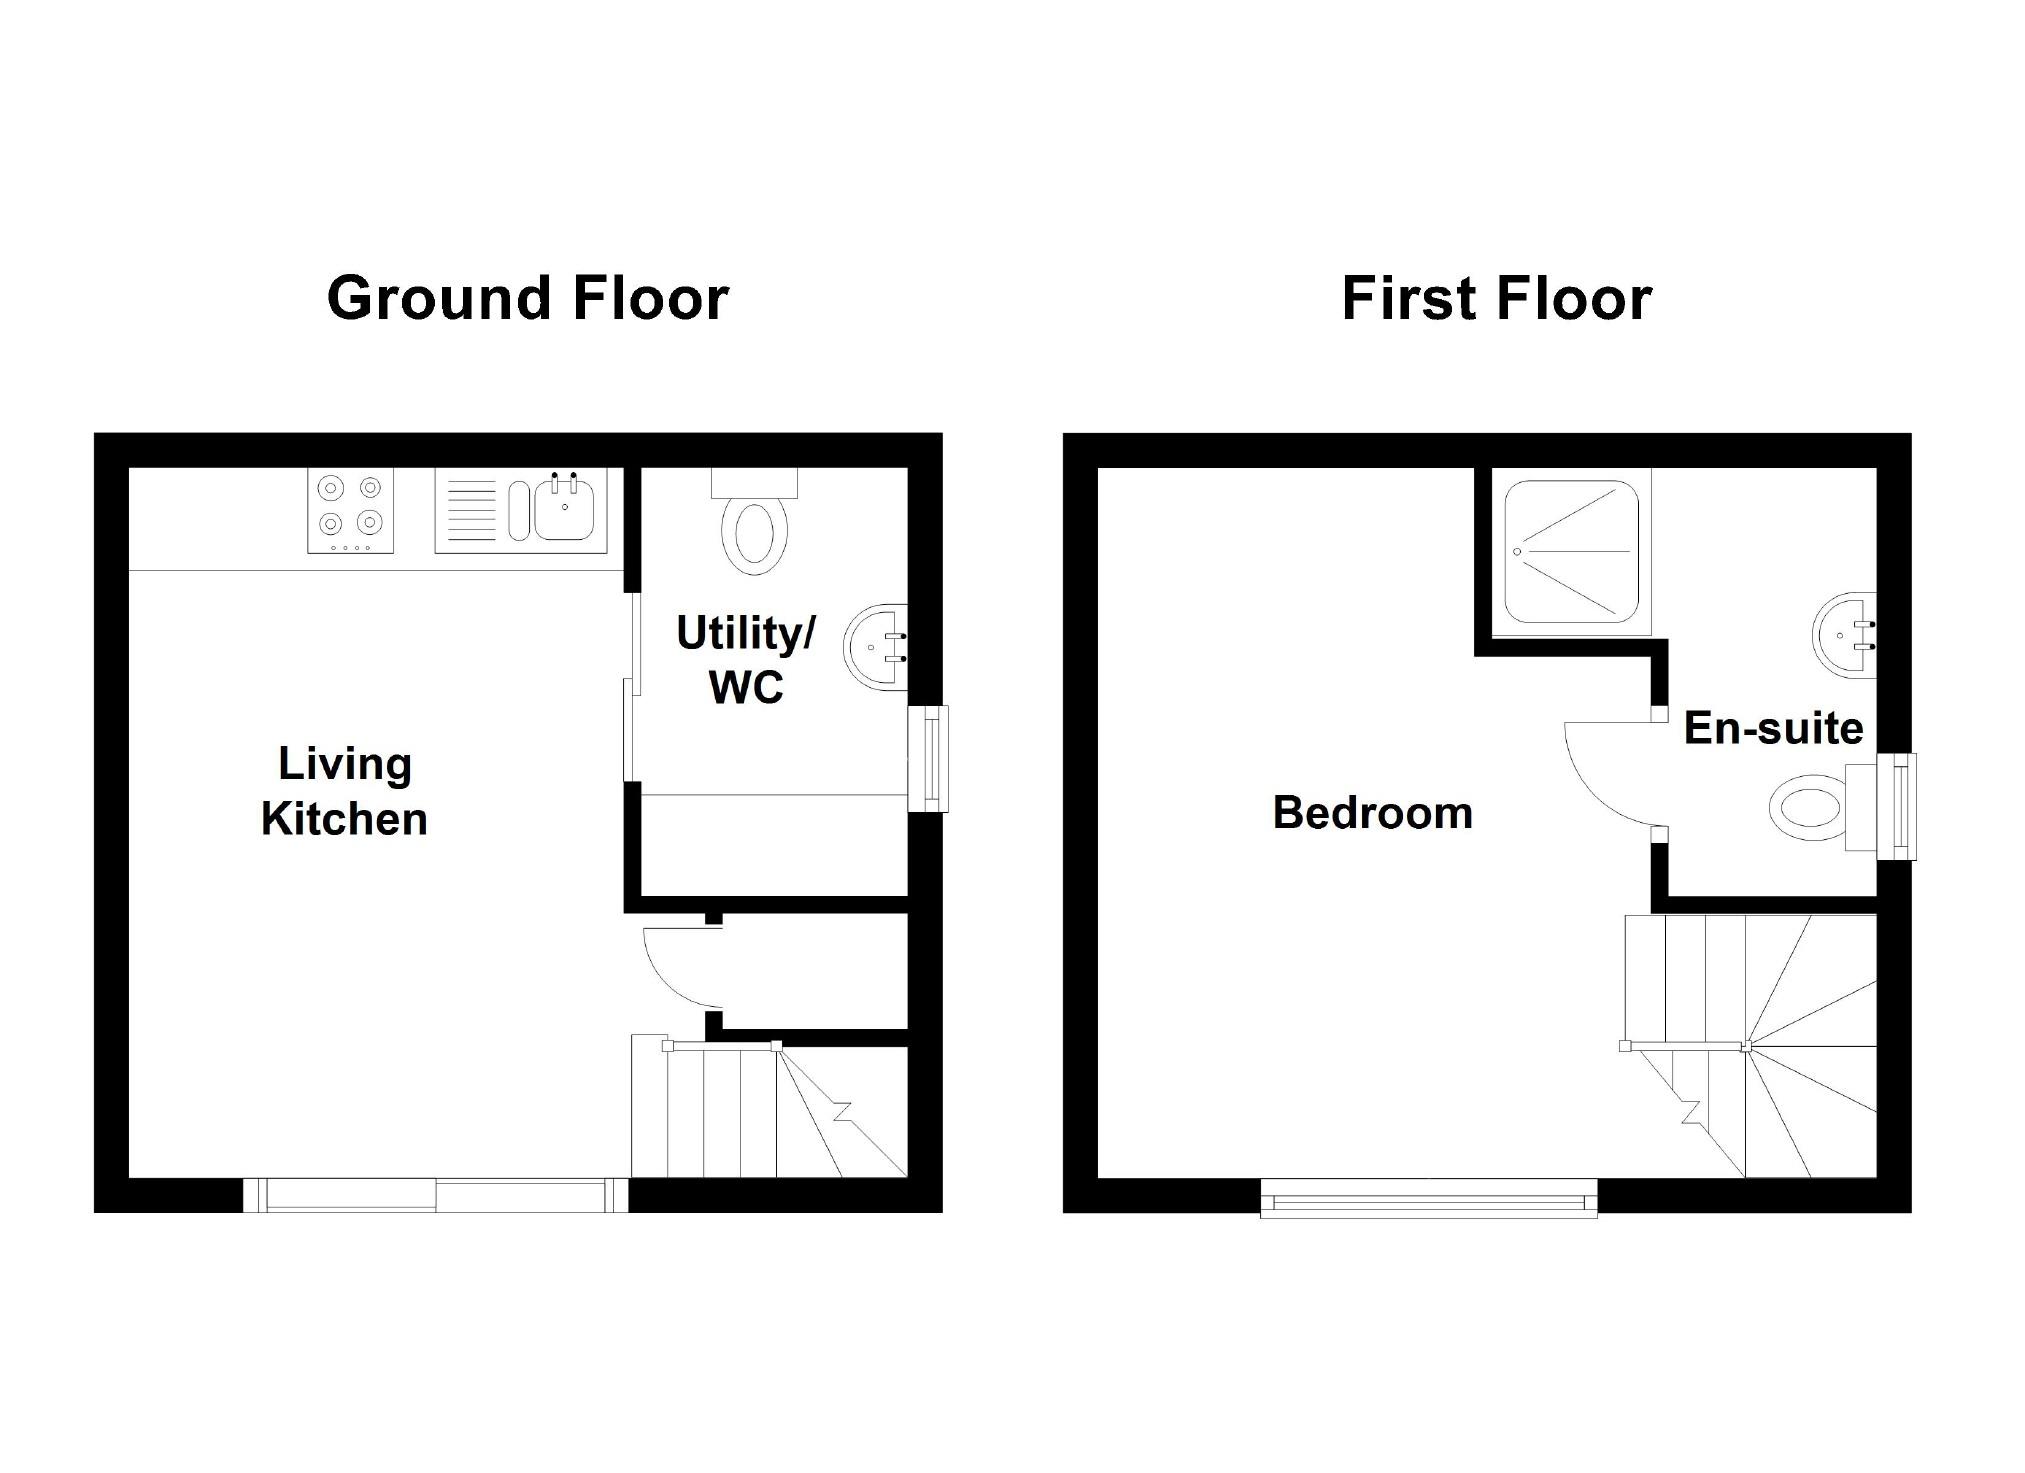 Broadgate beeston nottingham ng9 1 bedroom end terrace house for sale 45795937 primelocation for Food bar beeston